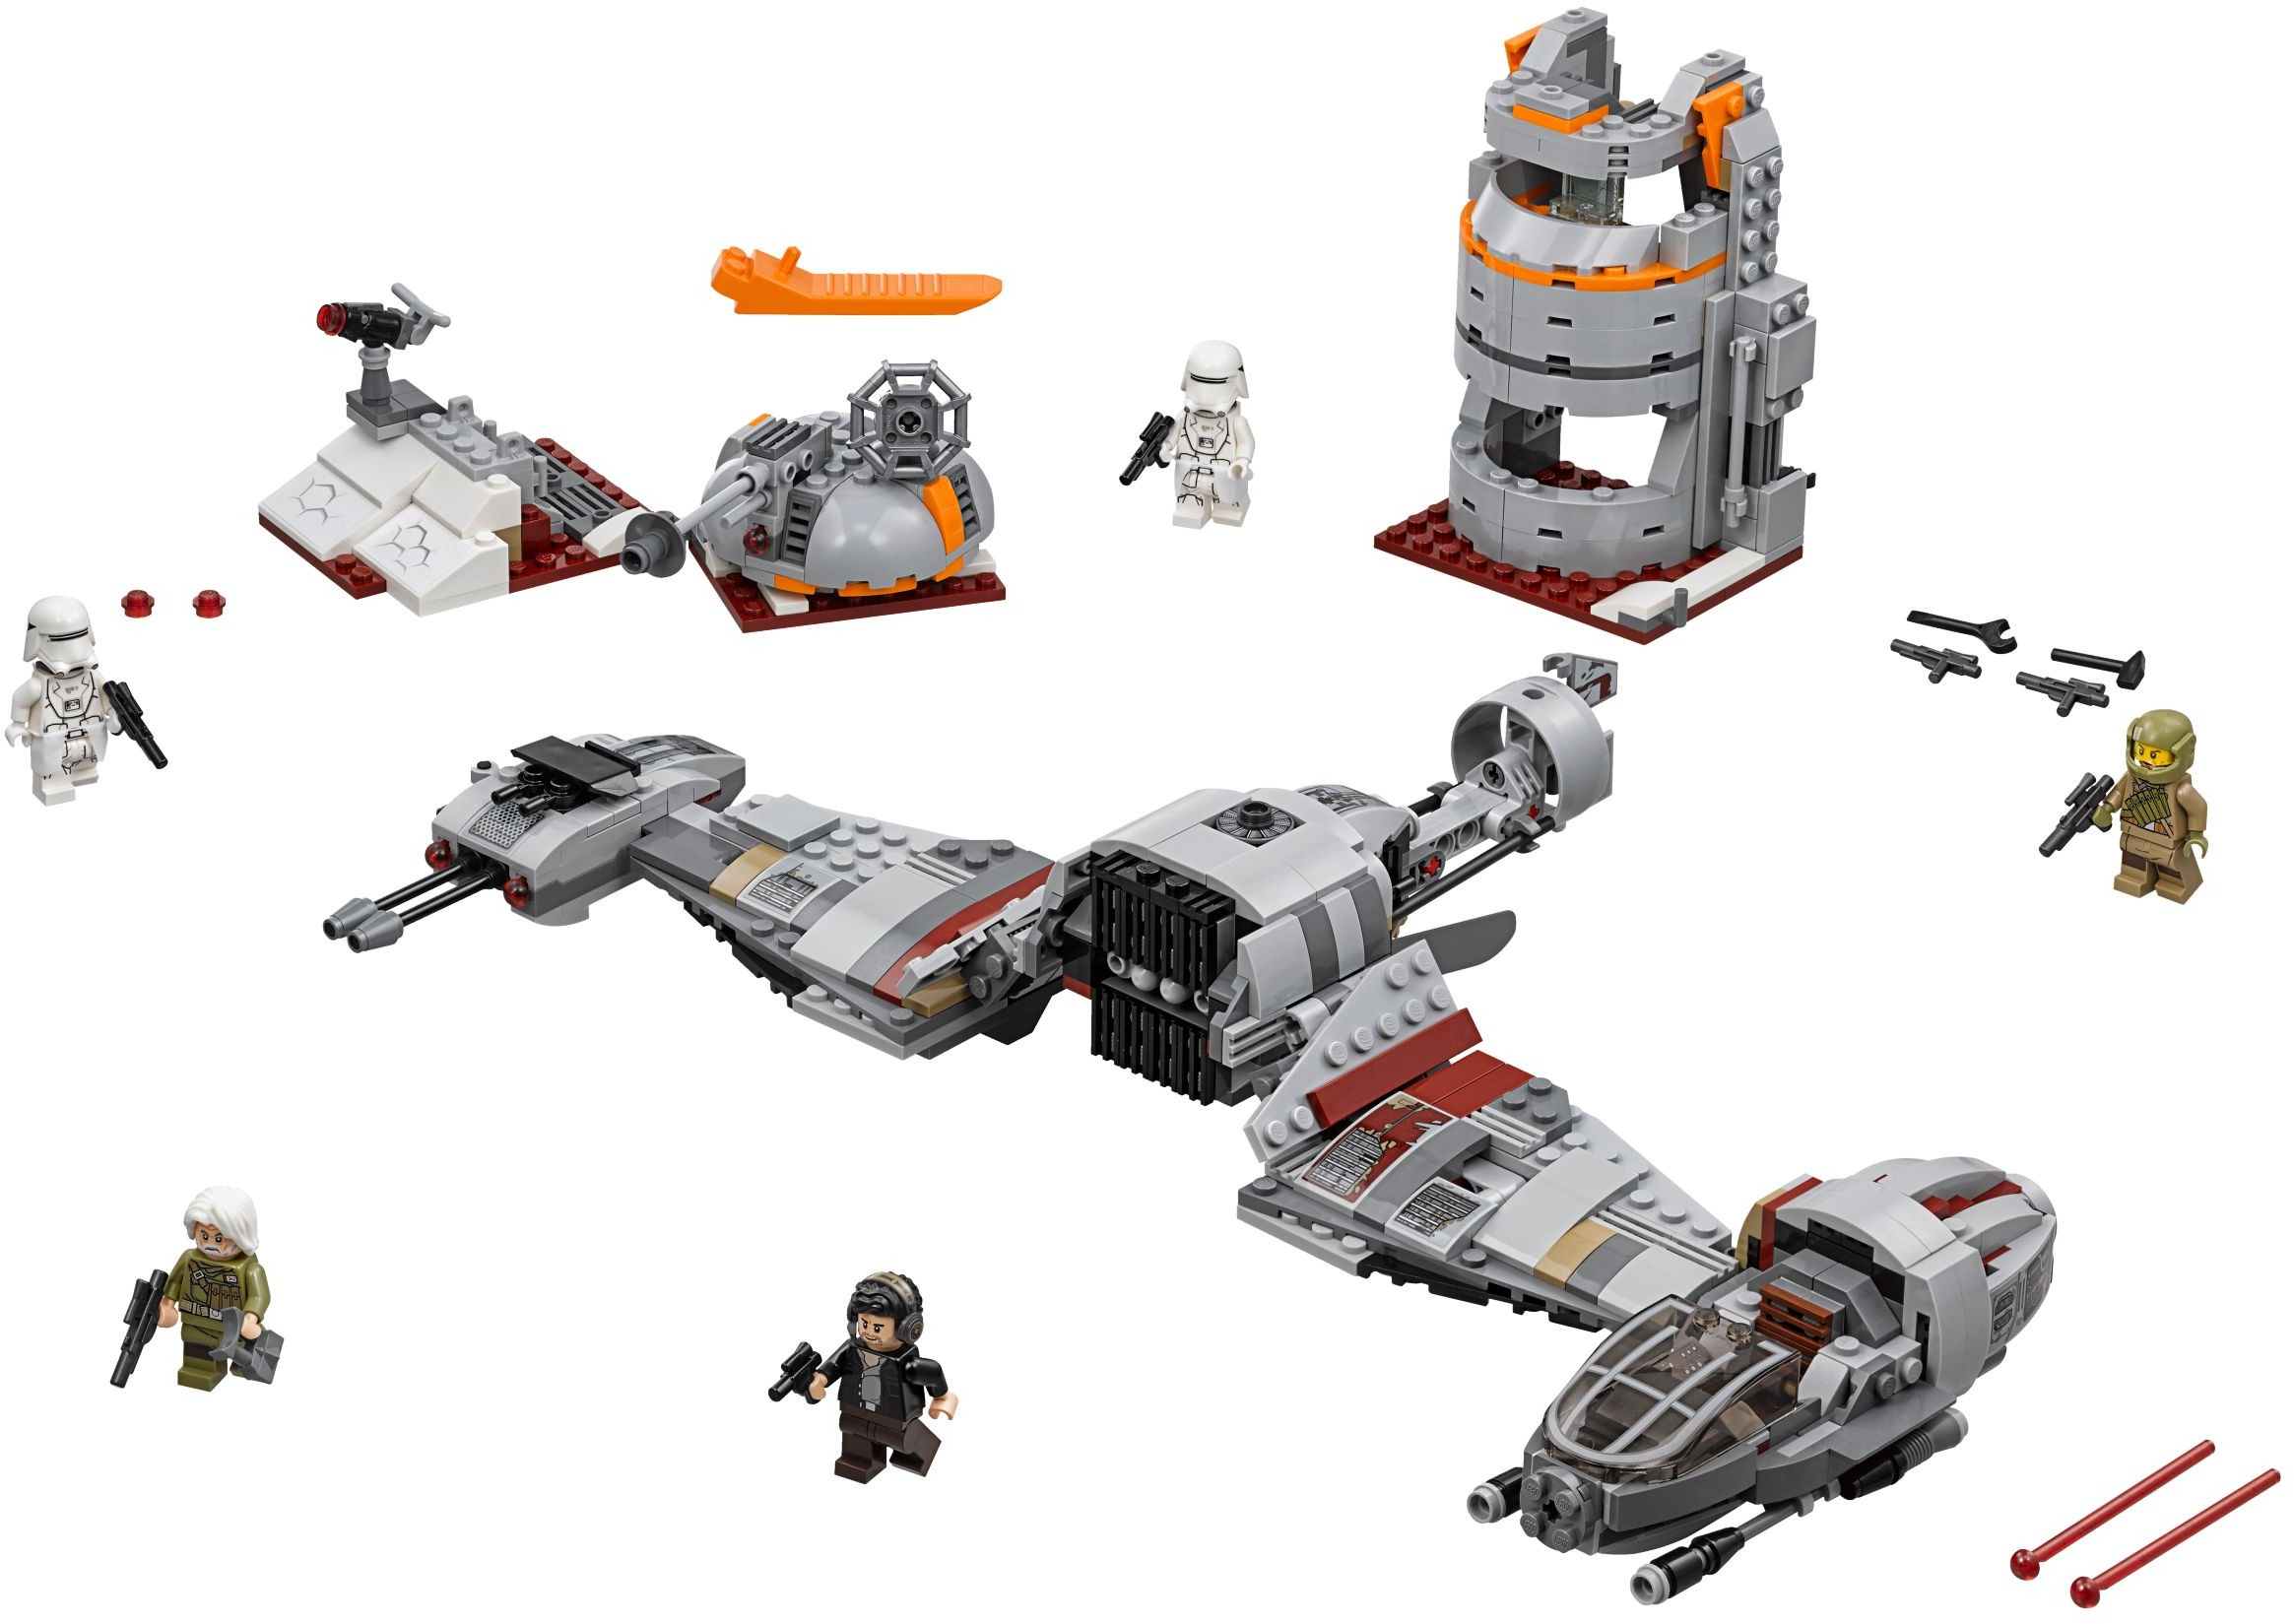 Star Wars   The Last Jedi   Brickset: LEGO set guide and database